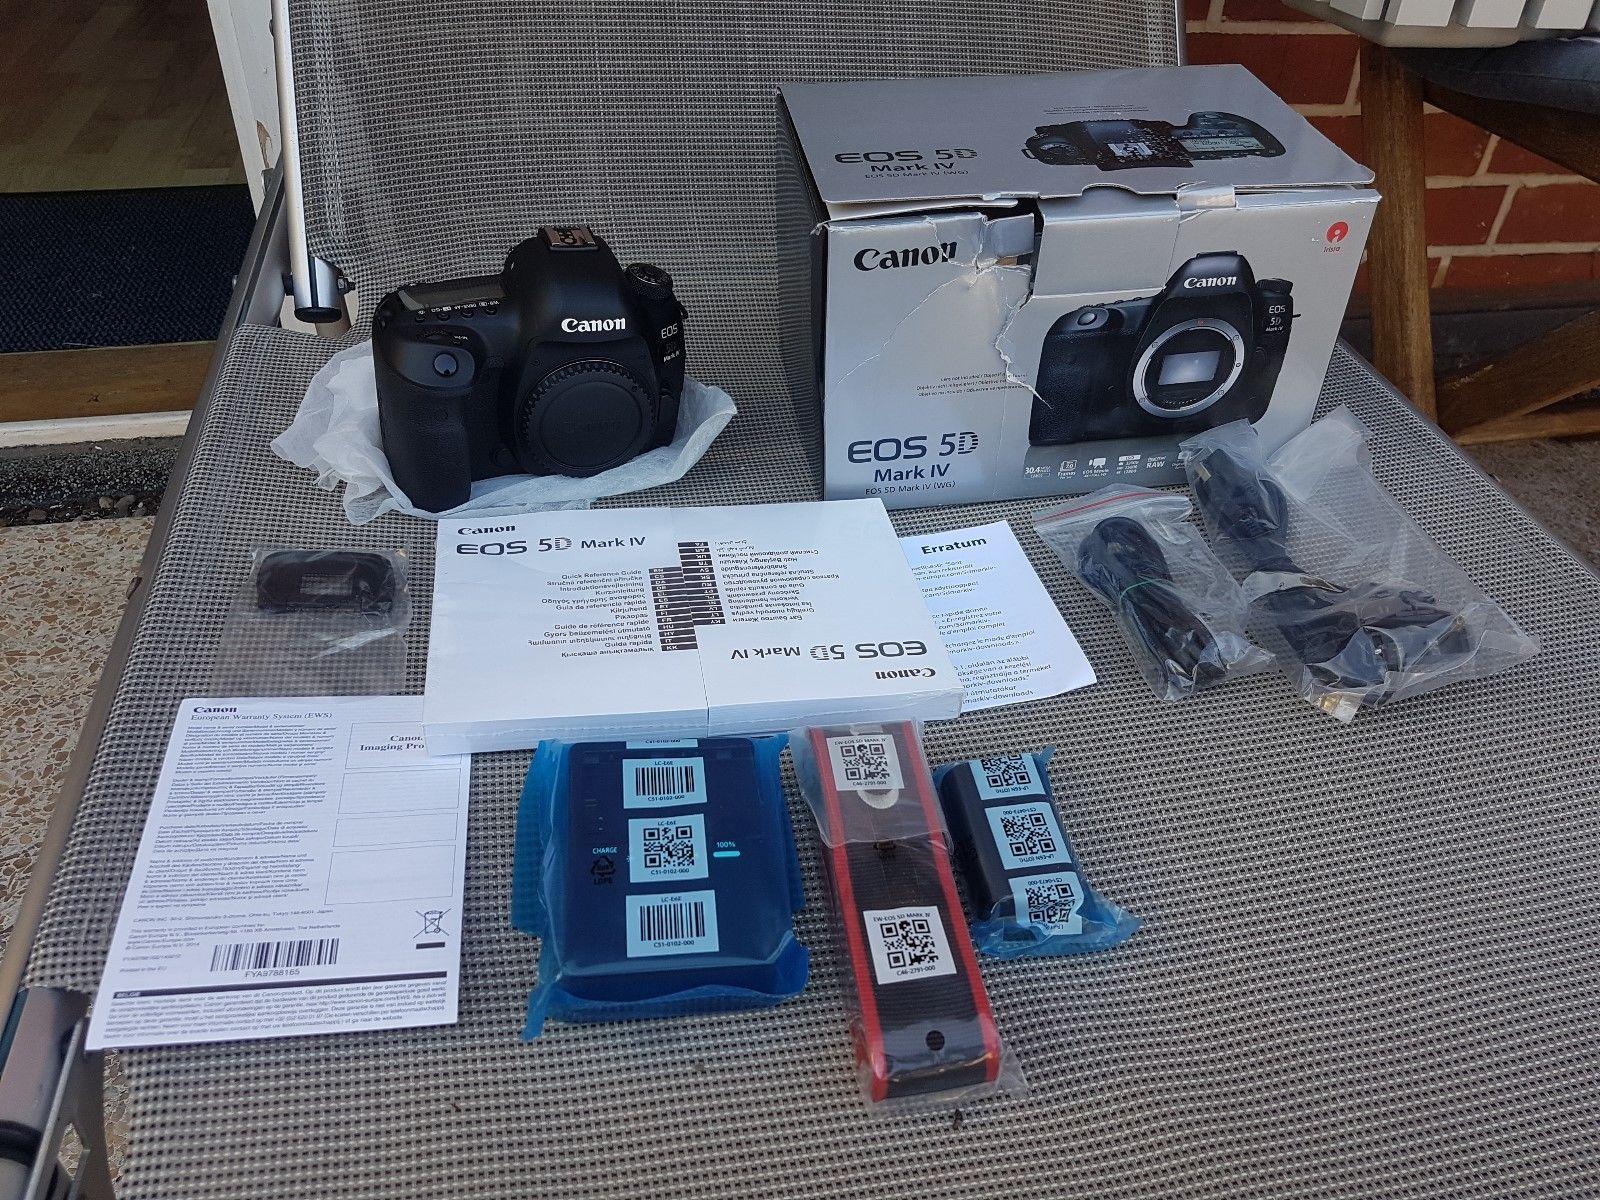 Canon EOS 5D Mark IV 30.4MP Digitalkamera in Schwarz.